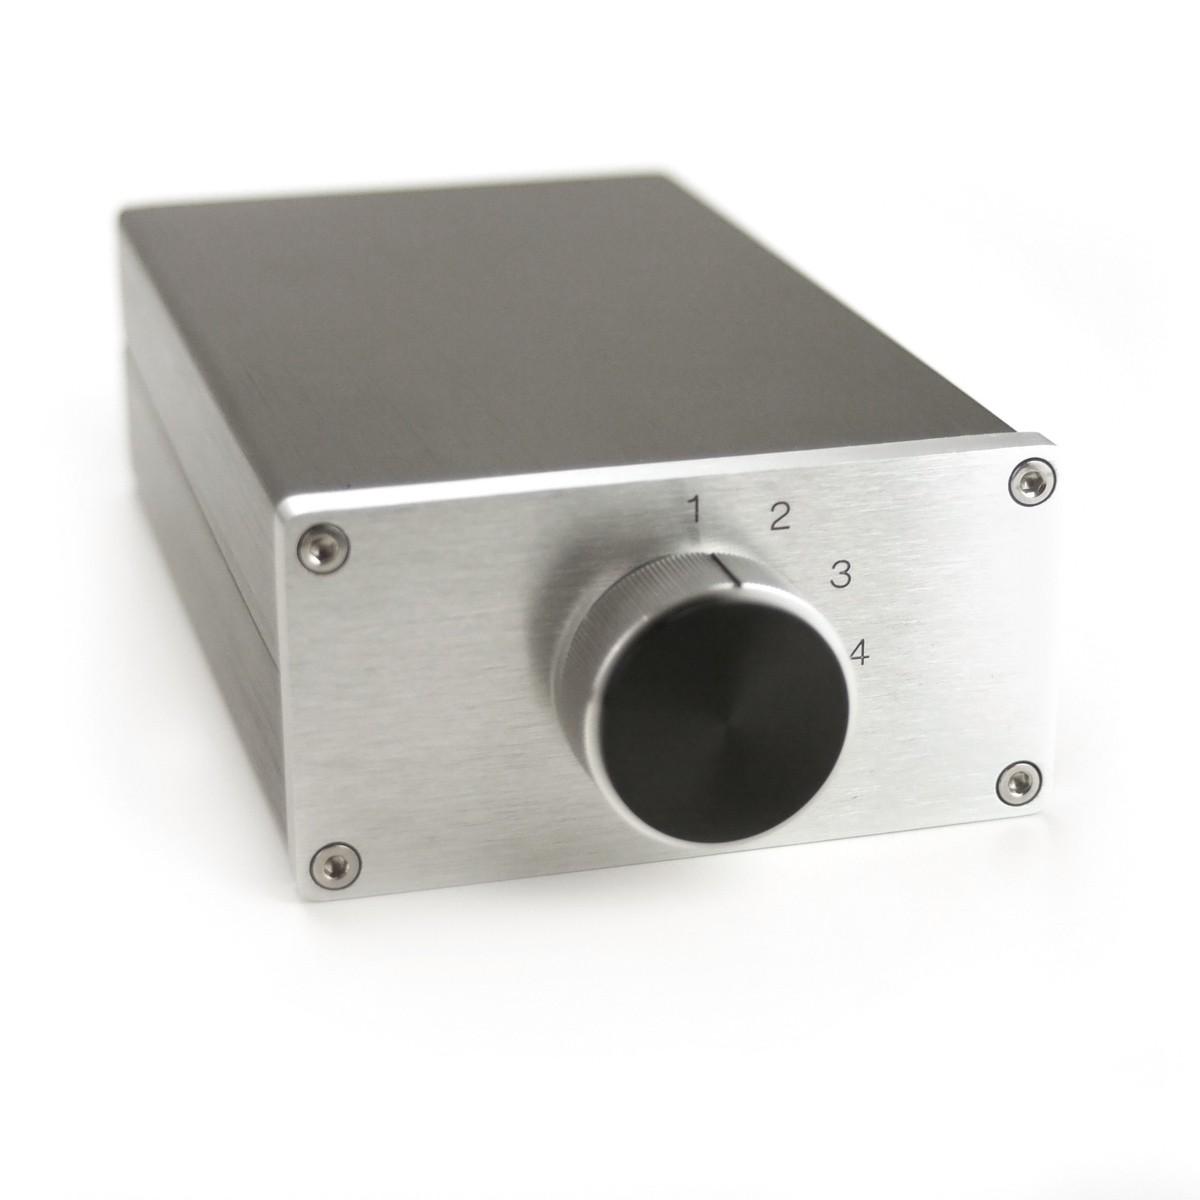 classi phoenix switch box aluminum enclosure 89 00. Black Bedroom Furniture Sets. Home Design Ideas